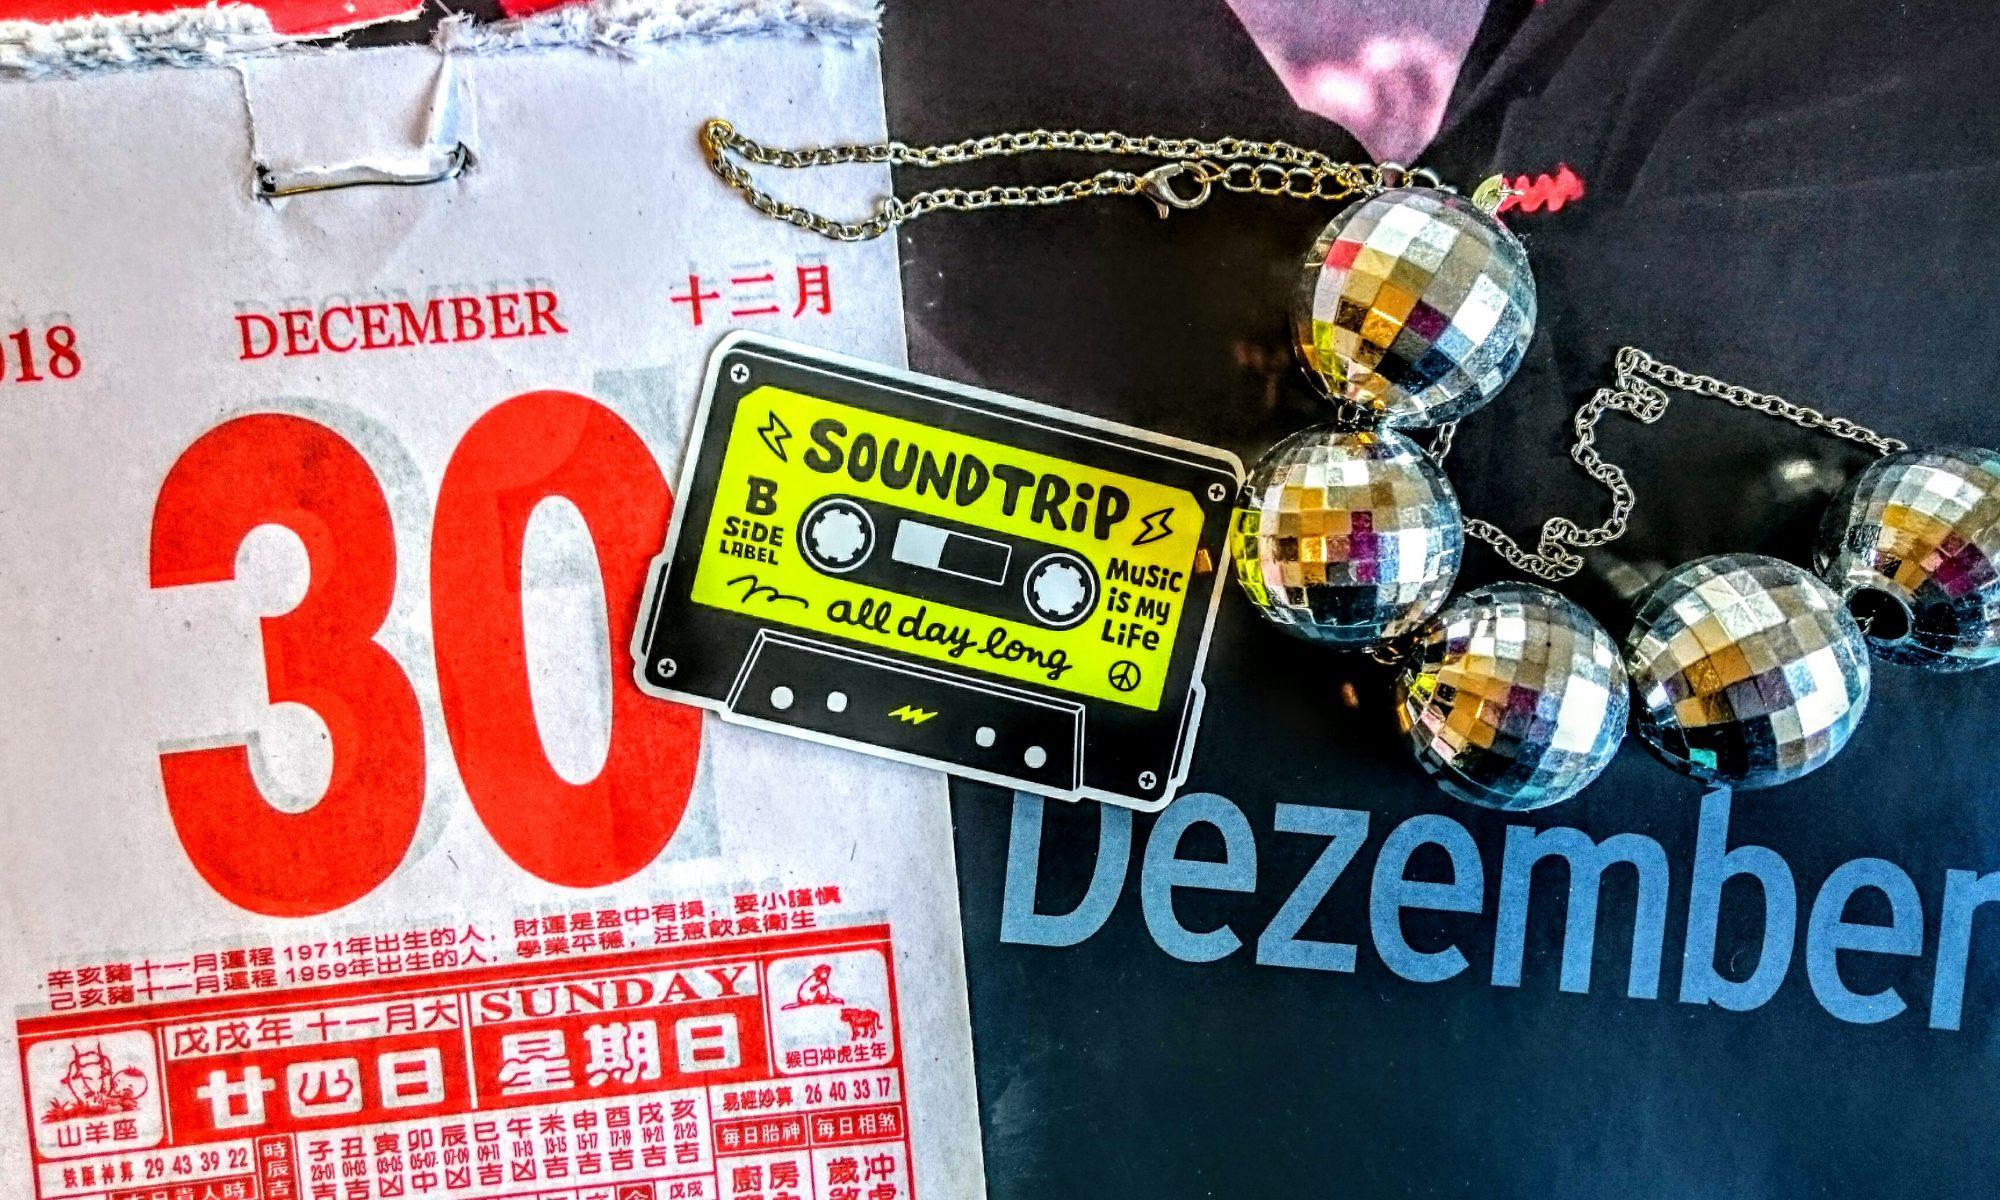 Biggy Pop, annual review, Jahresrückblick, 2018, calendar, mirrorball, discokugel, sticker, b-side-label, tape, december